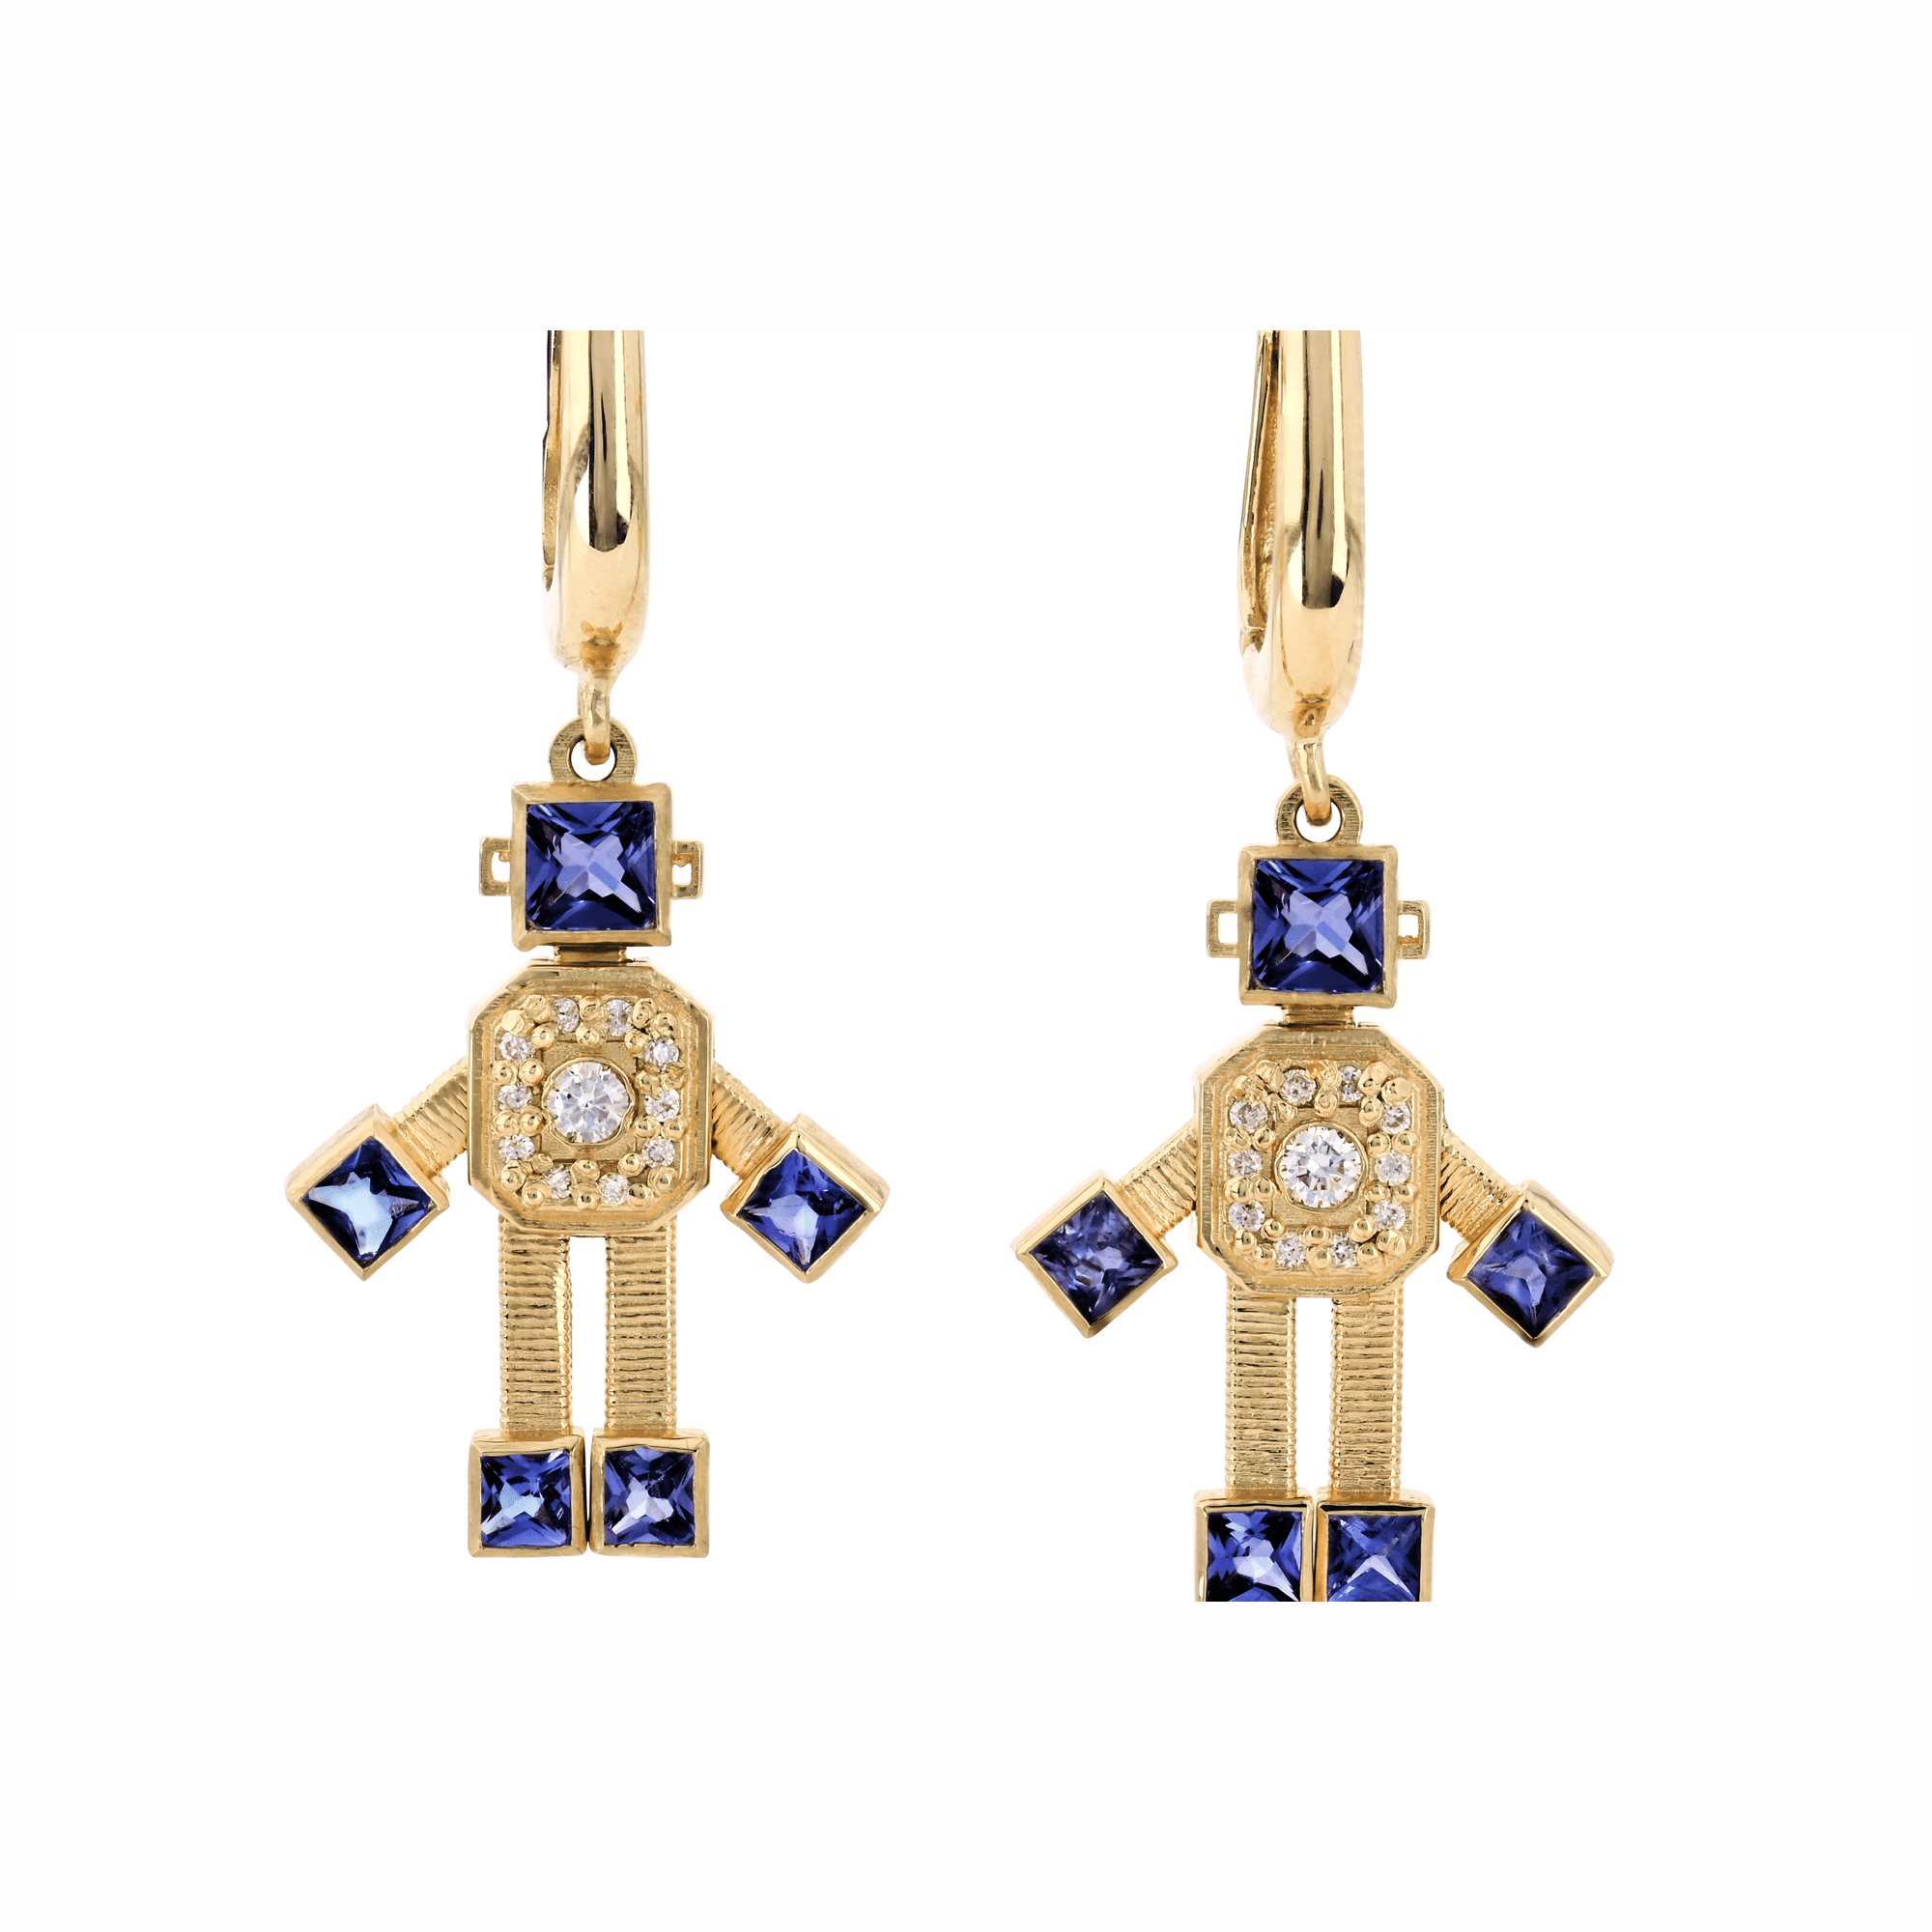 Rome VAN Robot Earrings